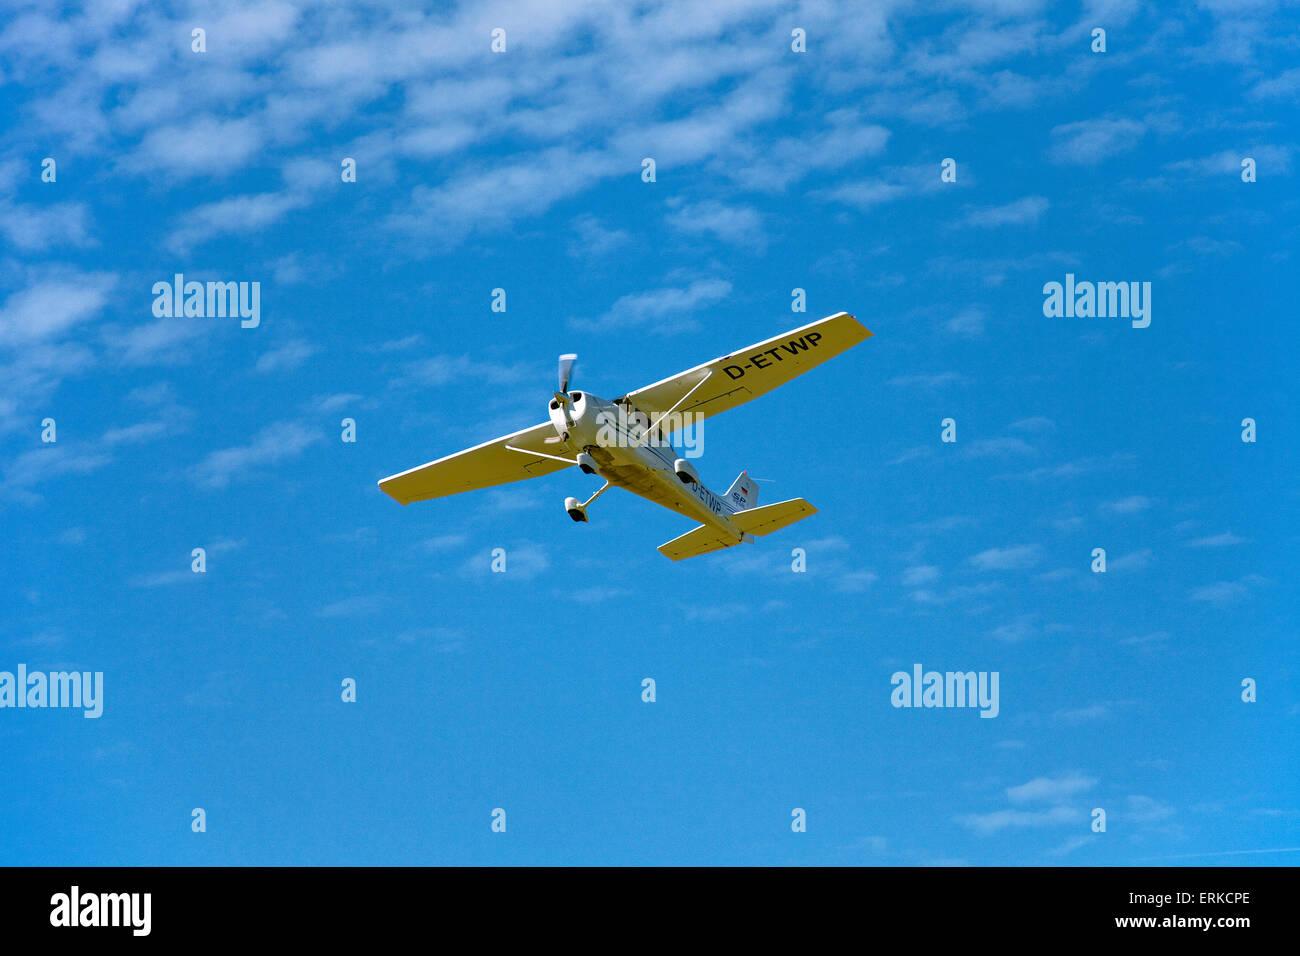 Sporting aeroplane approaching Trier-Föhren Airport, Föhren, Trier-Saarburg, Rhineland-Palatinate, Germany - Stock Image